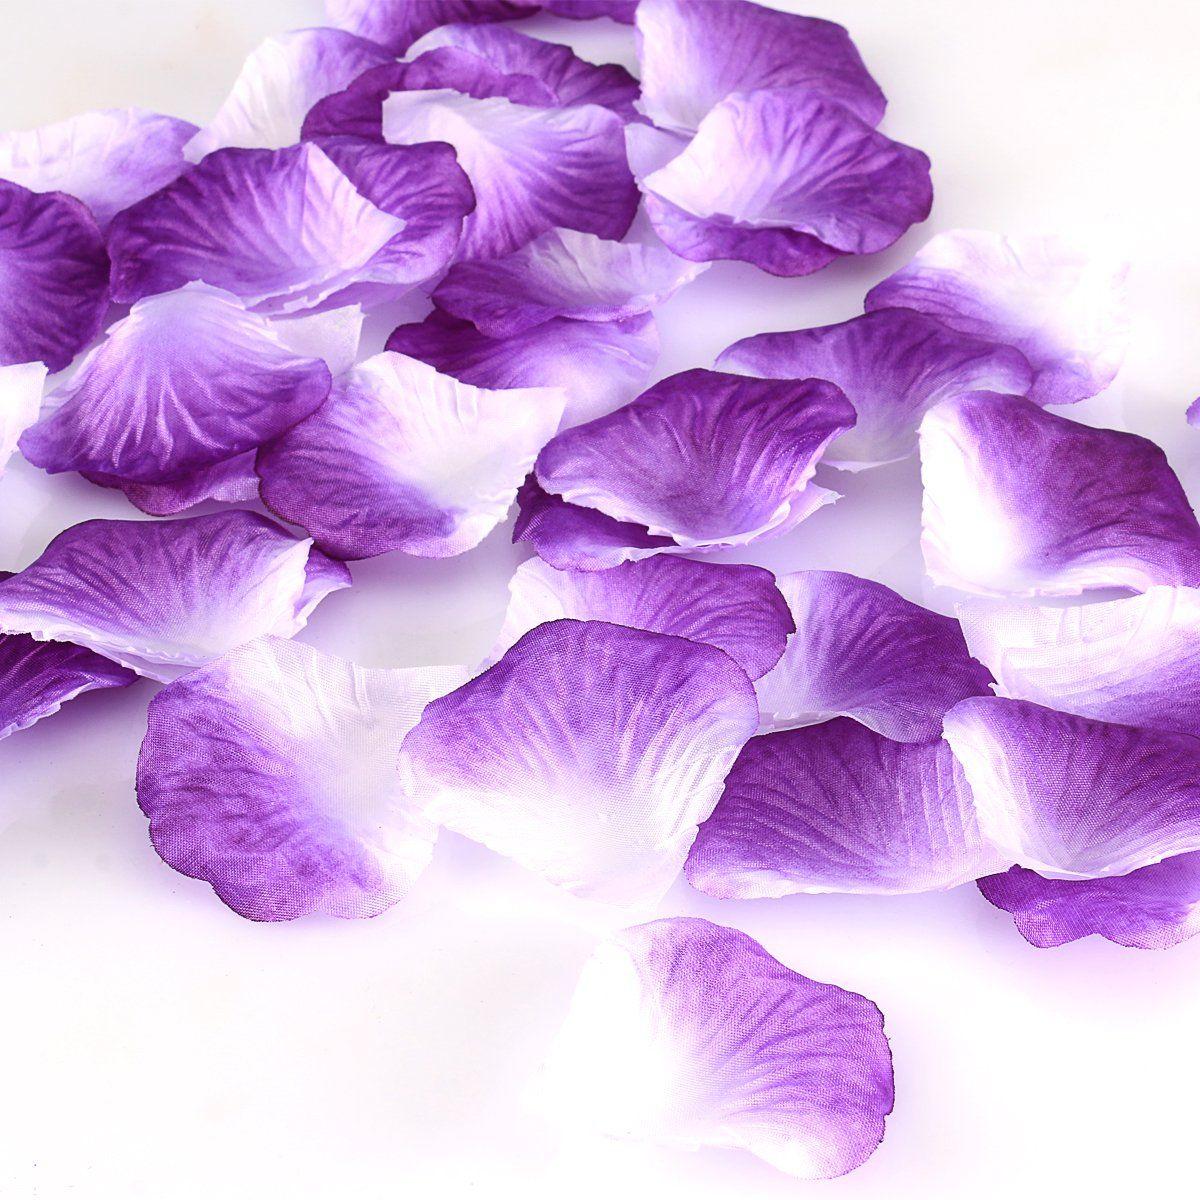 Hcstar 1200pcs silk rose petals mixed color artificial flower hcstar 1200pcs silk rose petals mixed color artificial flower wedding party vase home decor bridal petals mightylinksfo Image collections